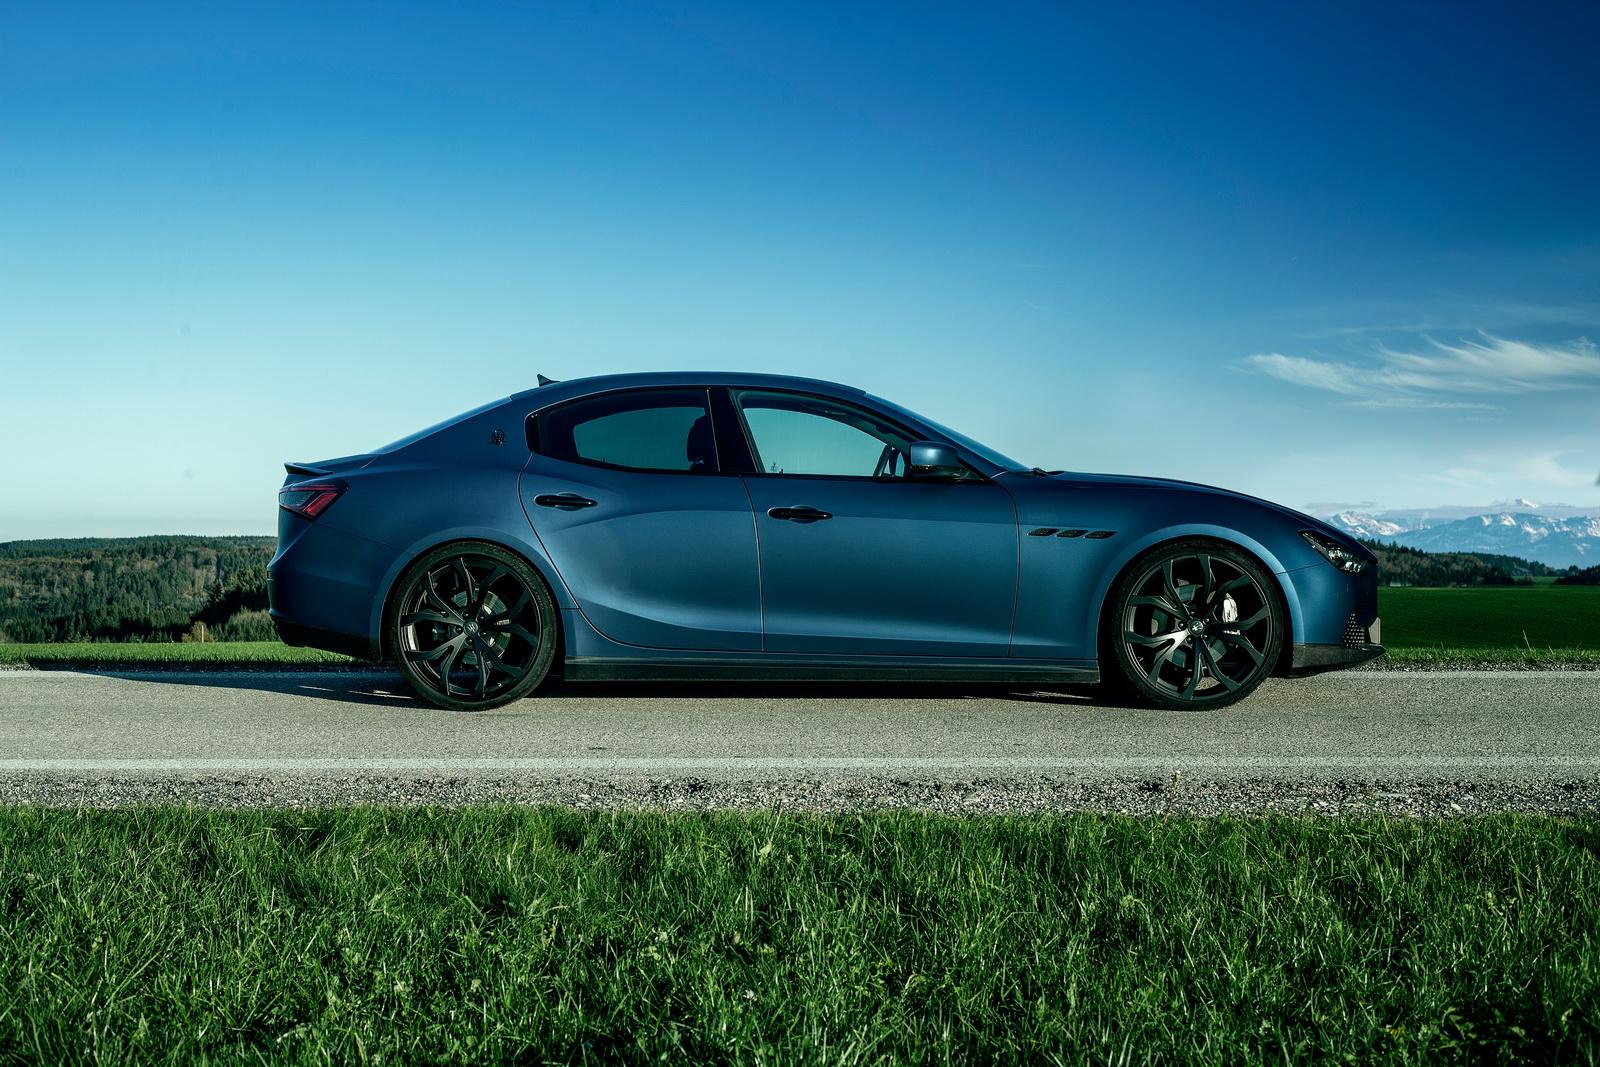 New Maserati Ghibli Power-Tuned by Novitec | Carscoops